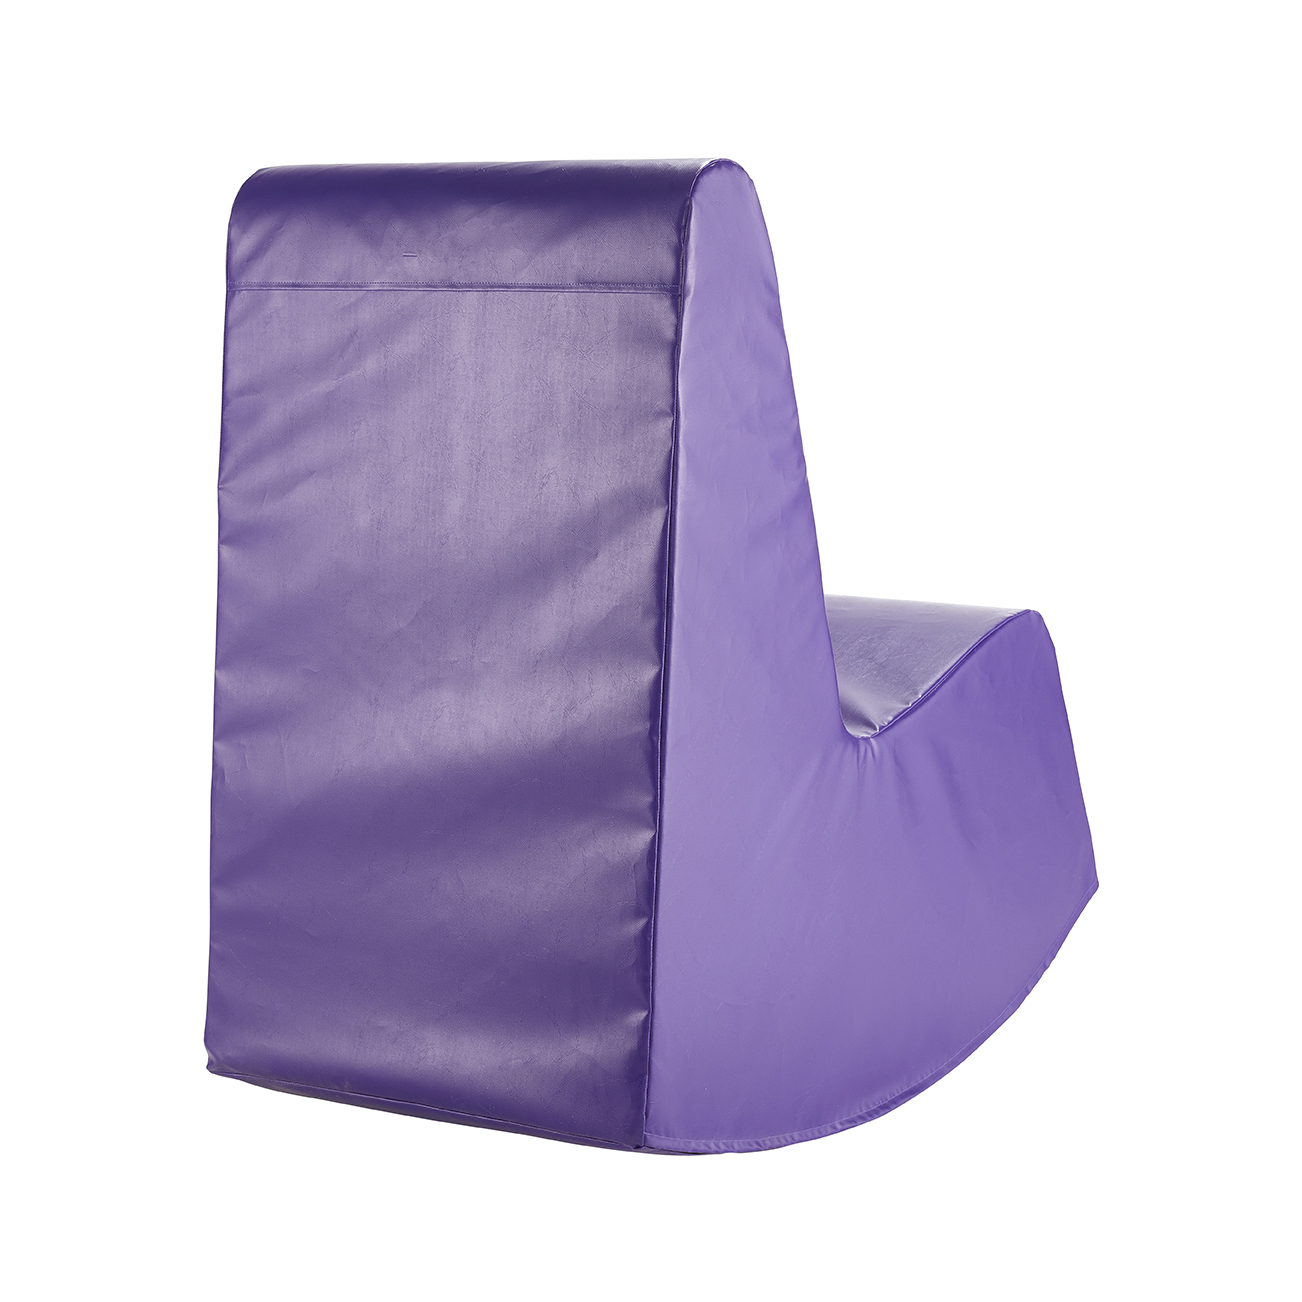 Glyss Foam Rocking Chair Knightsbridge Furniture